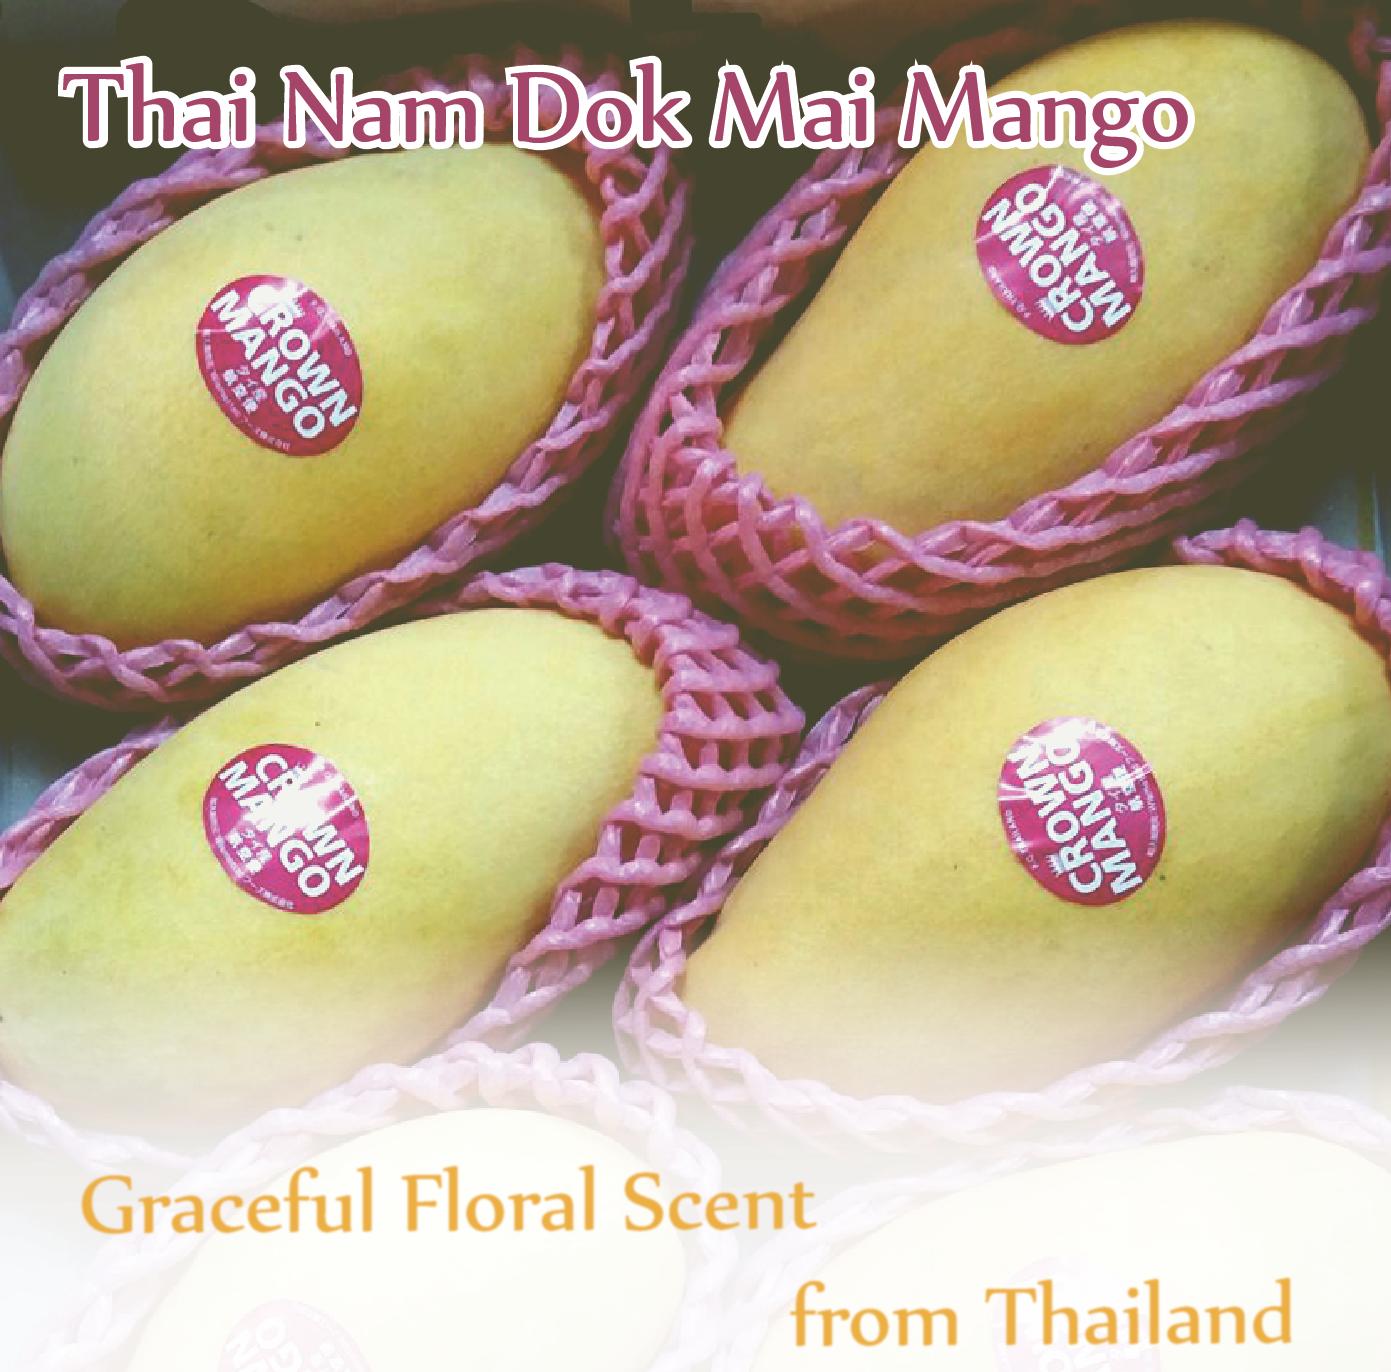 Thai Nam Dok Mai Mango